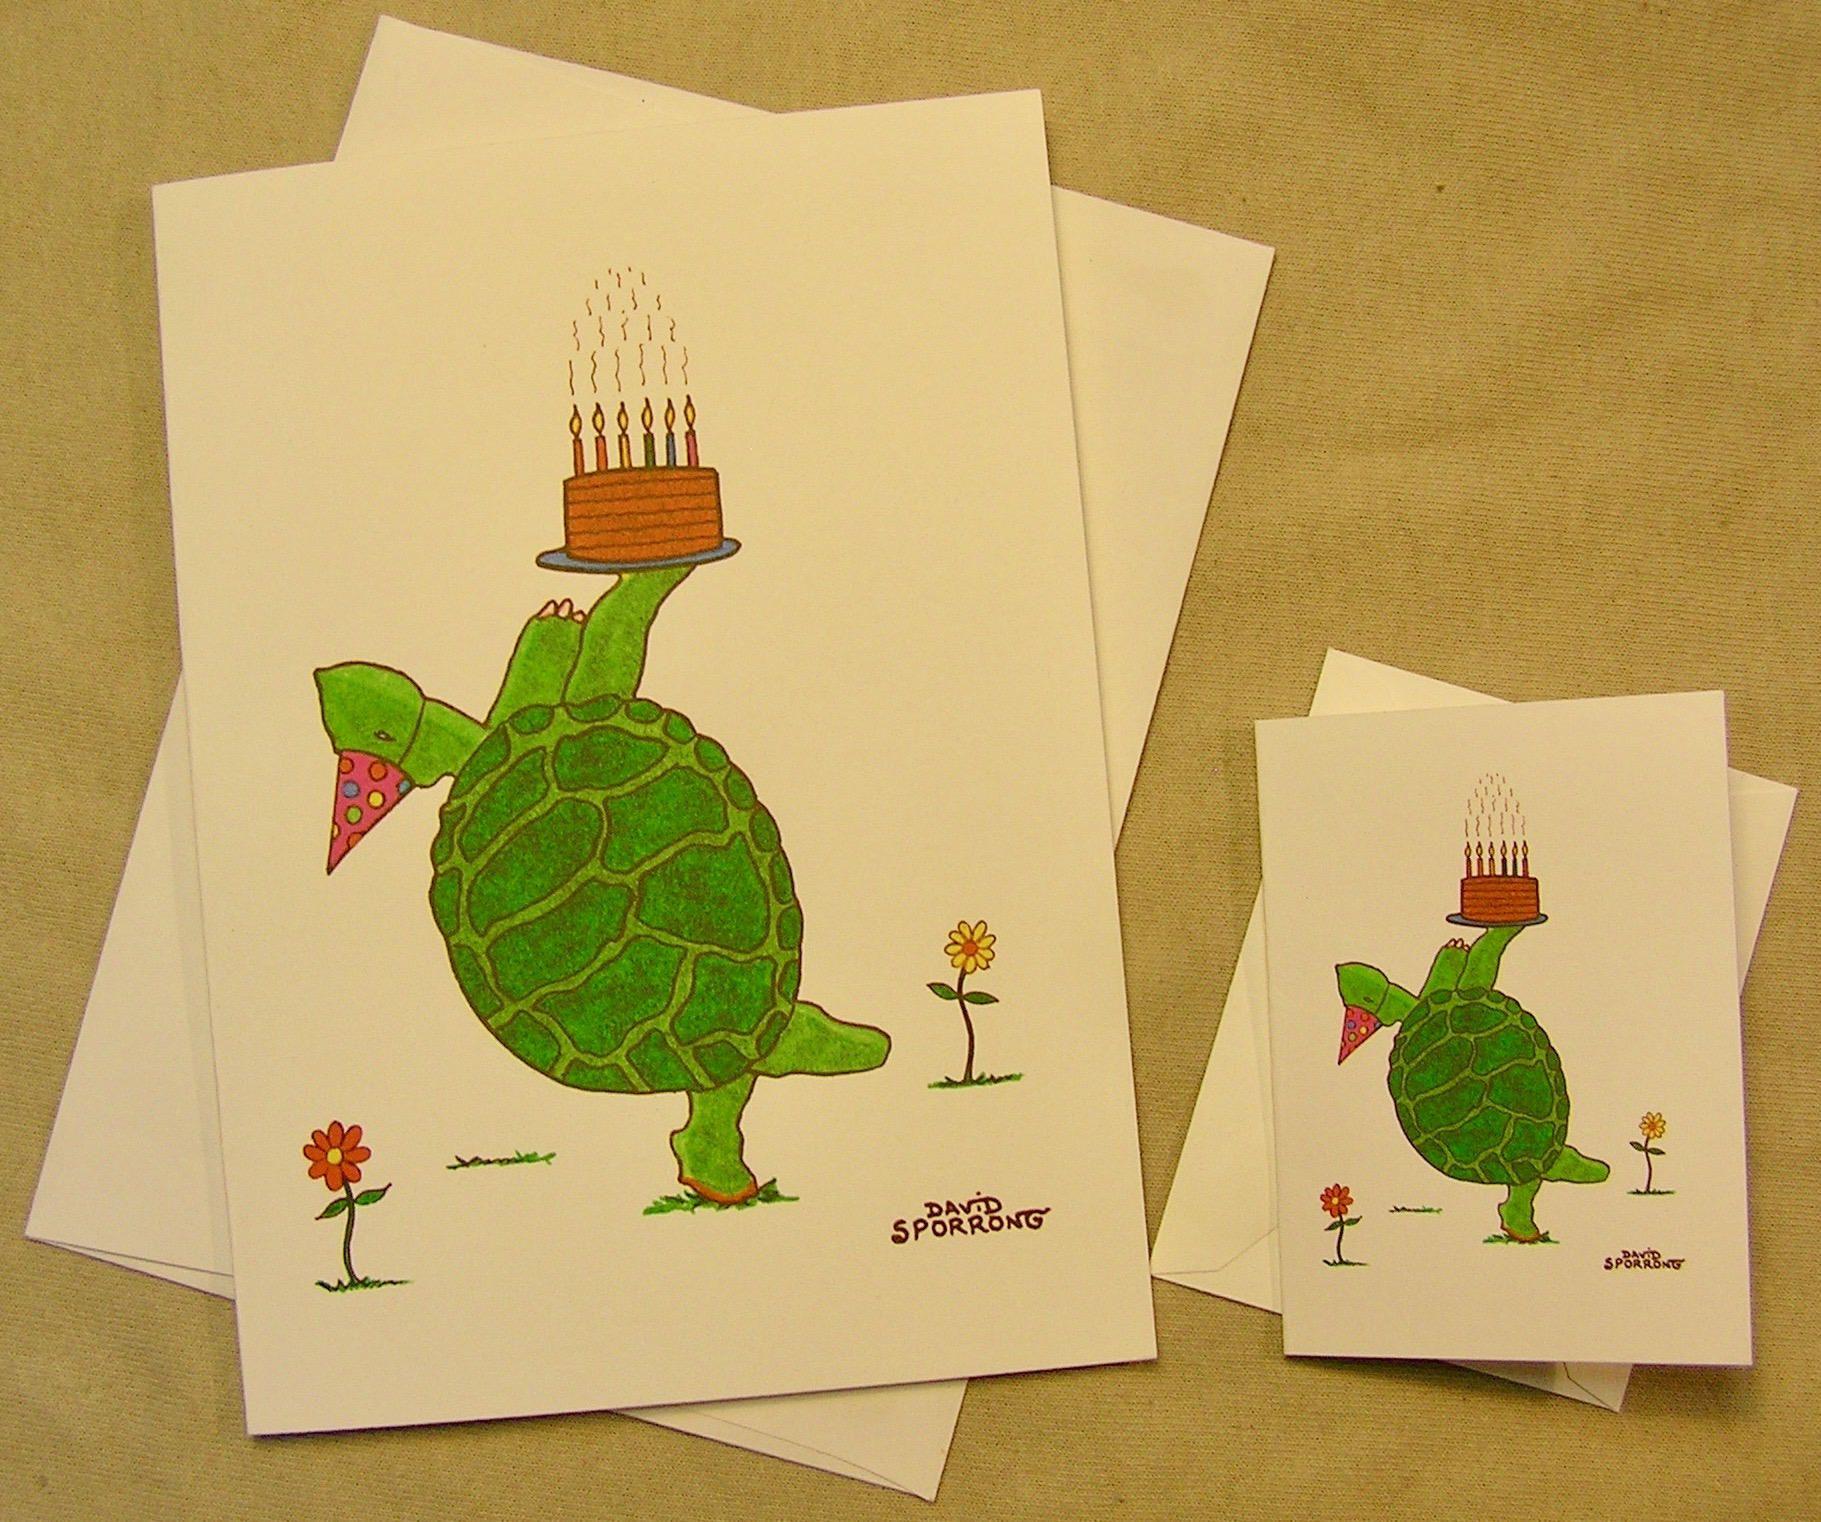 Grateful dead birthday card dancing terrapin regular size card and grateful dead birthday card dancing terrapin regular size card and mini version kristyandbryce Gallery